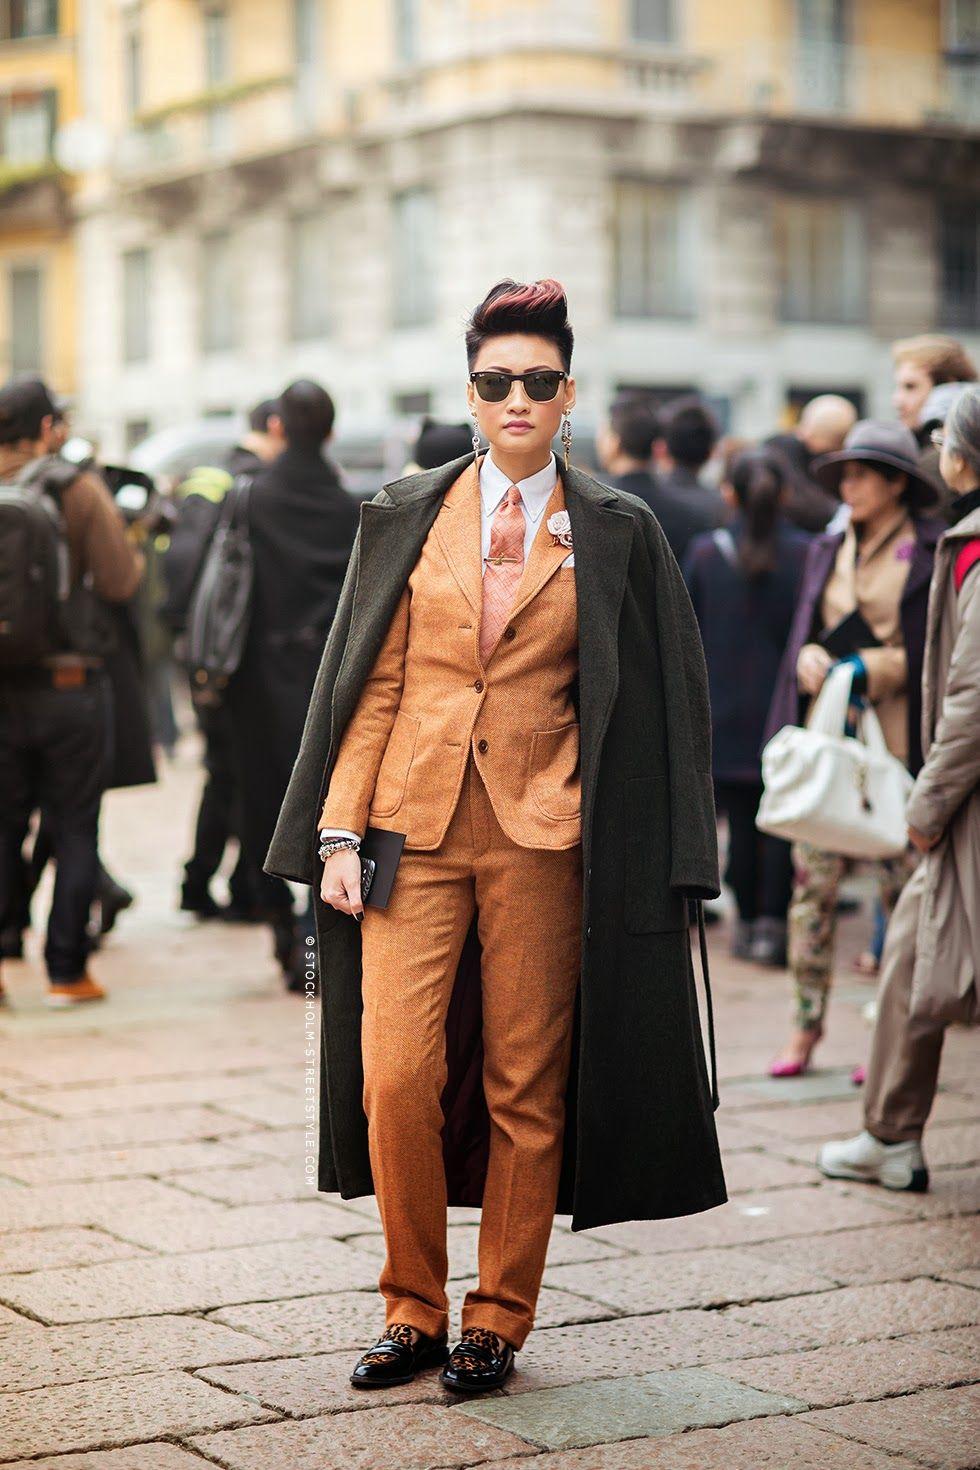 Menswear inspired suit fashion menswear inspired